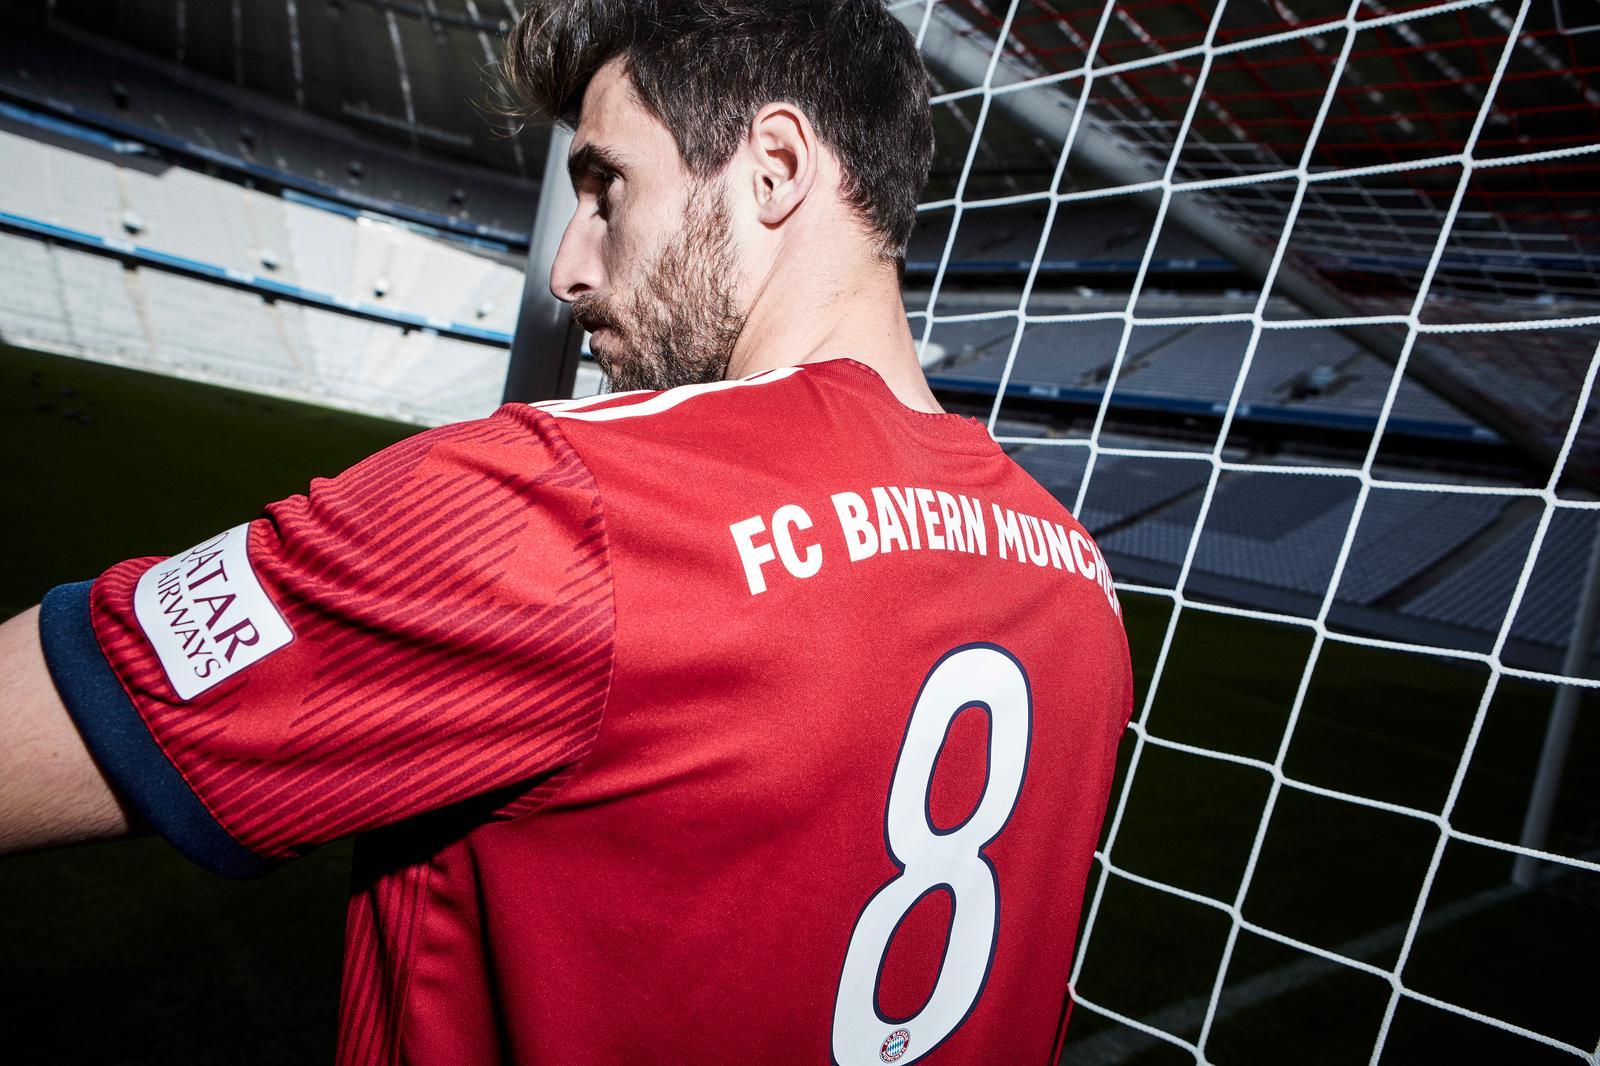 FC Bayern printing 2018/19